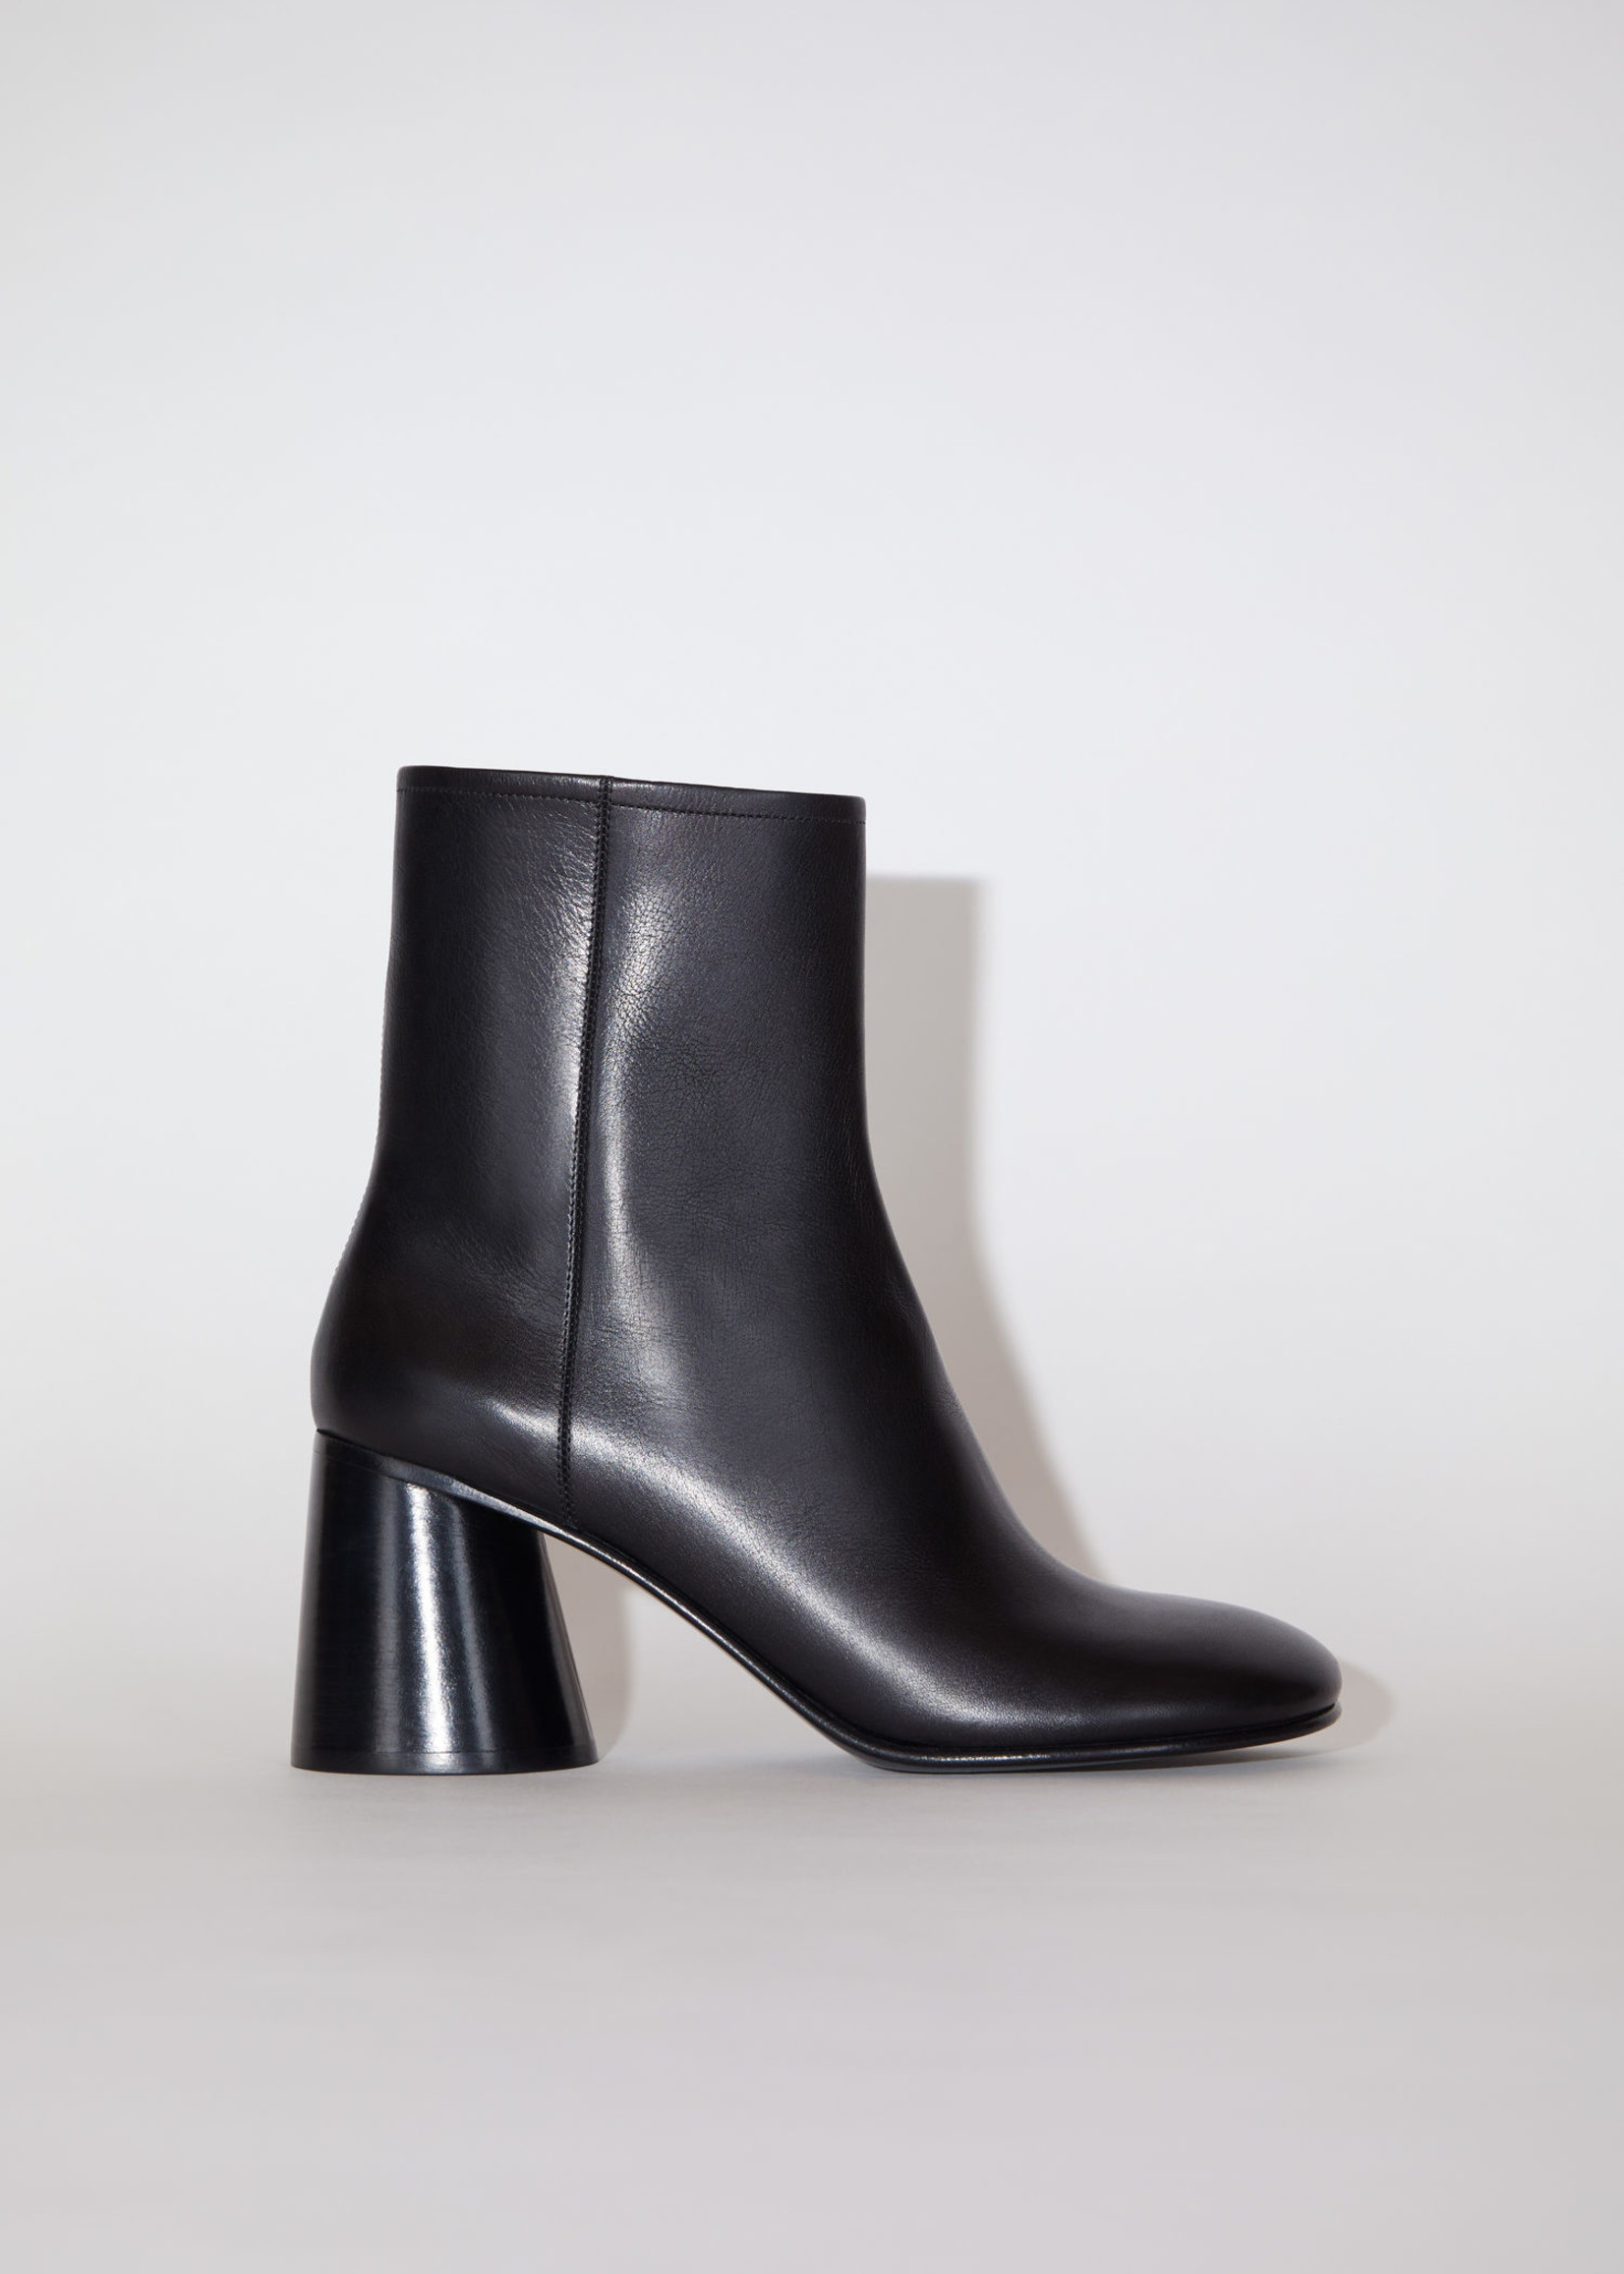 Acnestudios Acnestudios  boots round heel black 39